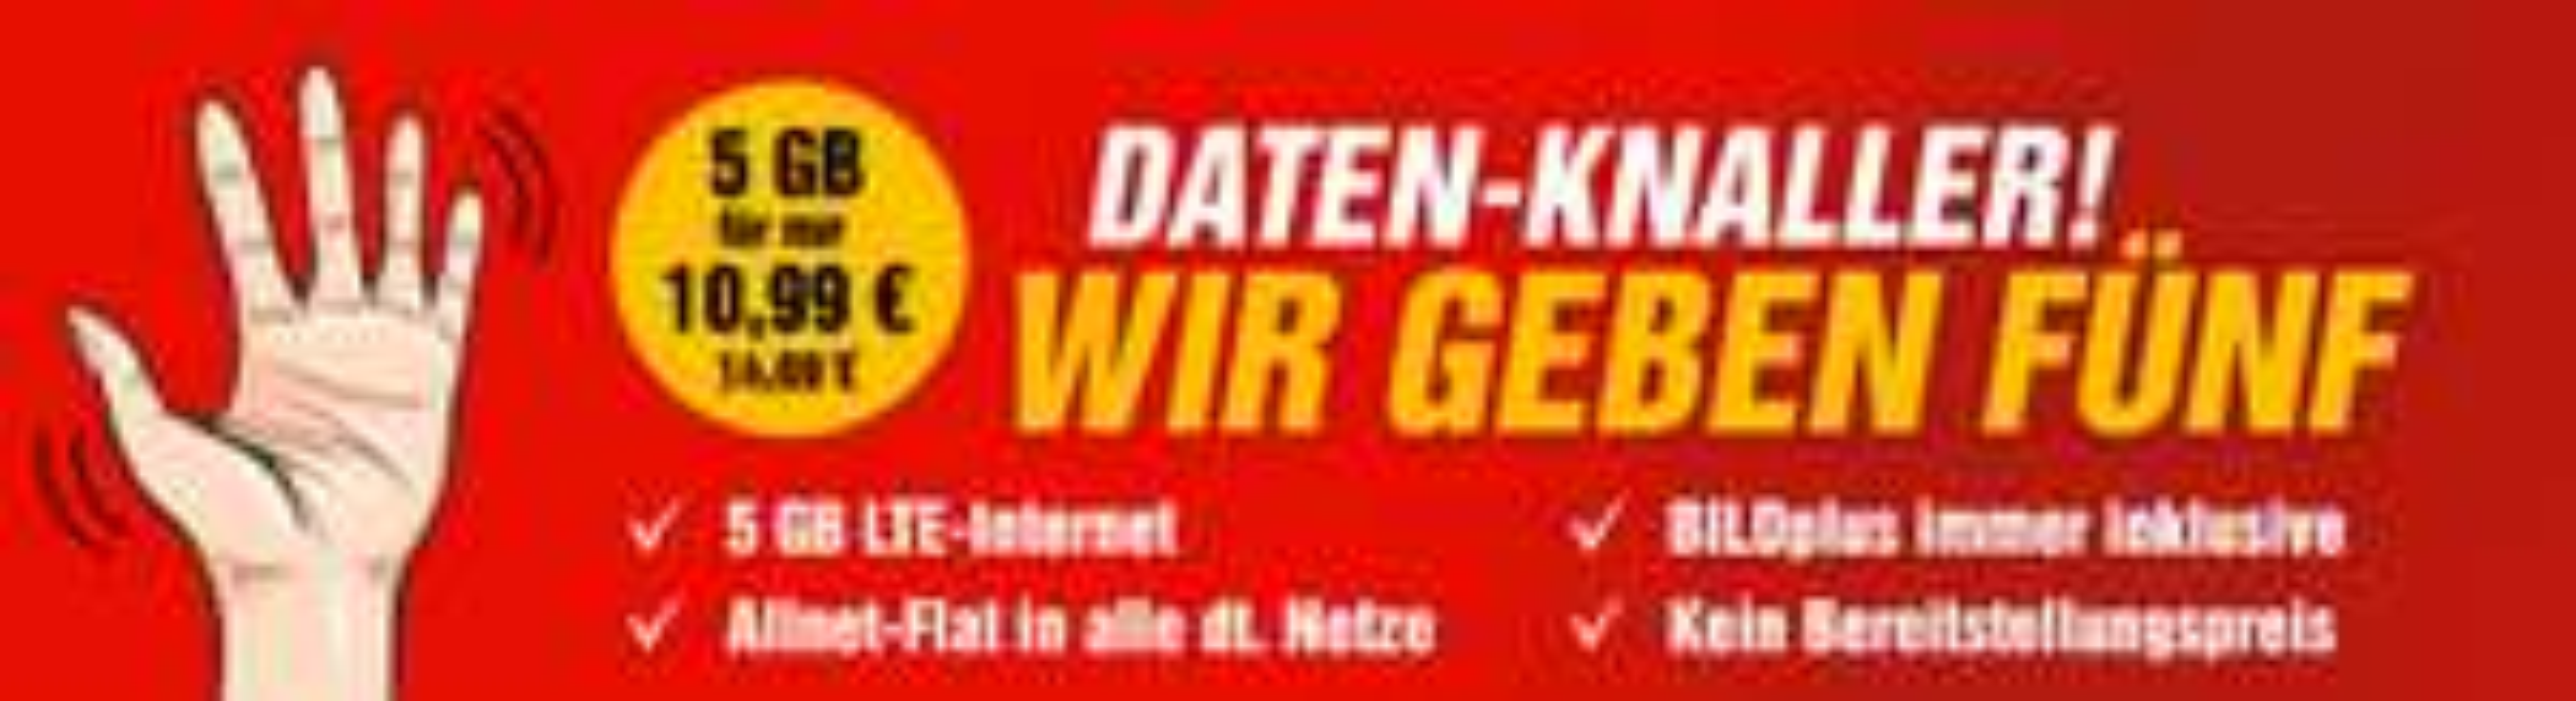 Bildconnect 5 GB LTE (O2 Netz, 50MBit/s) + Allnet-Flat + Bildplus für 10,99/Monat